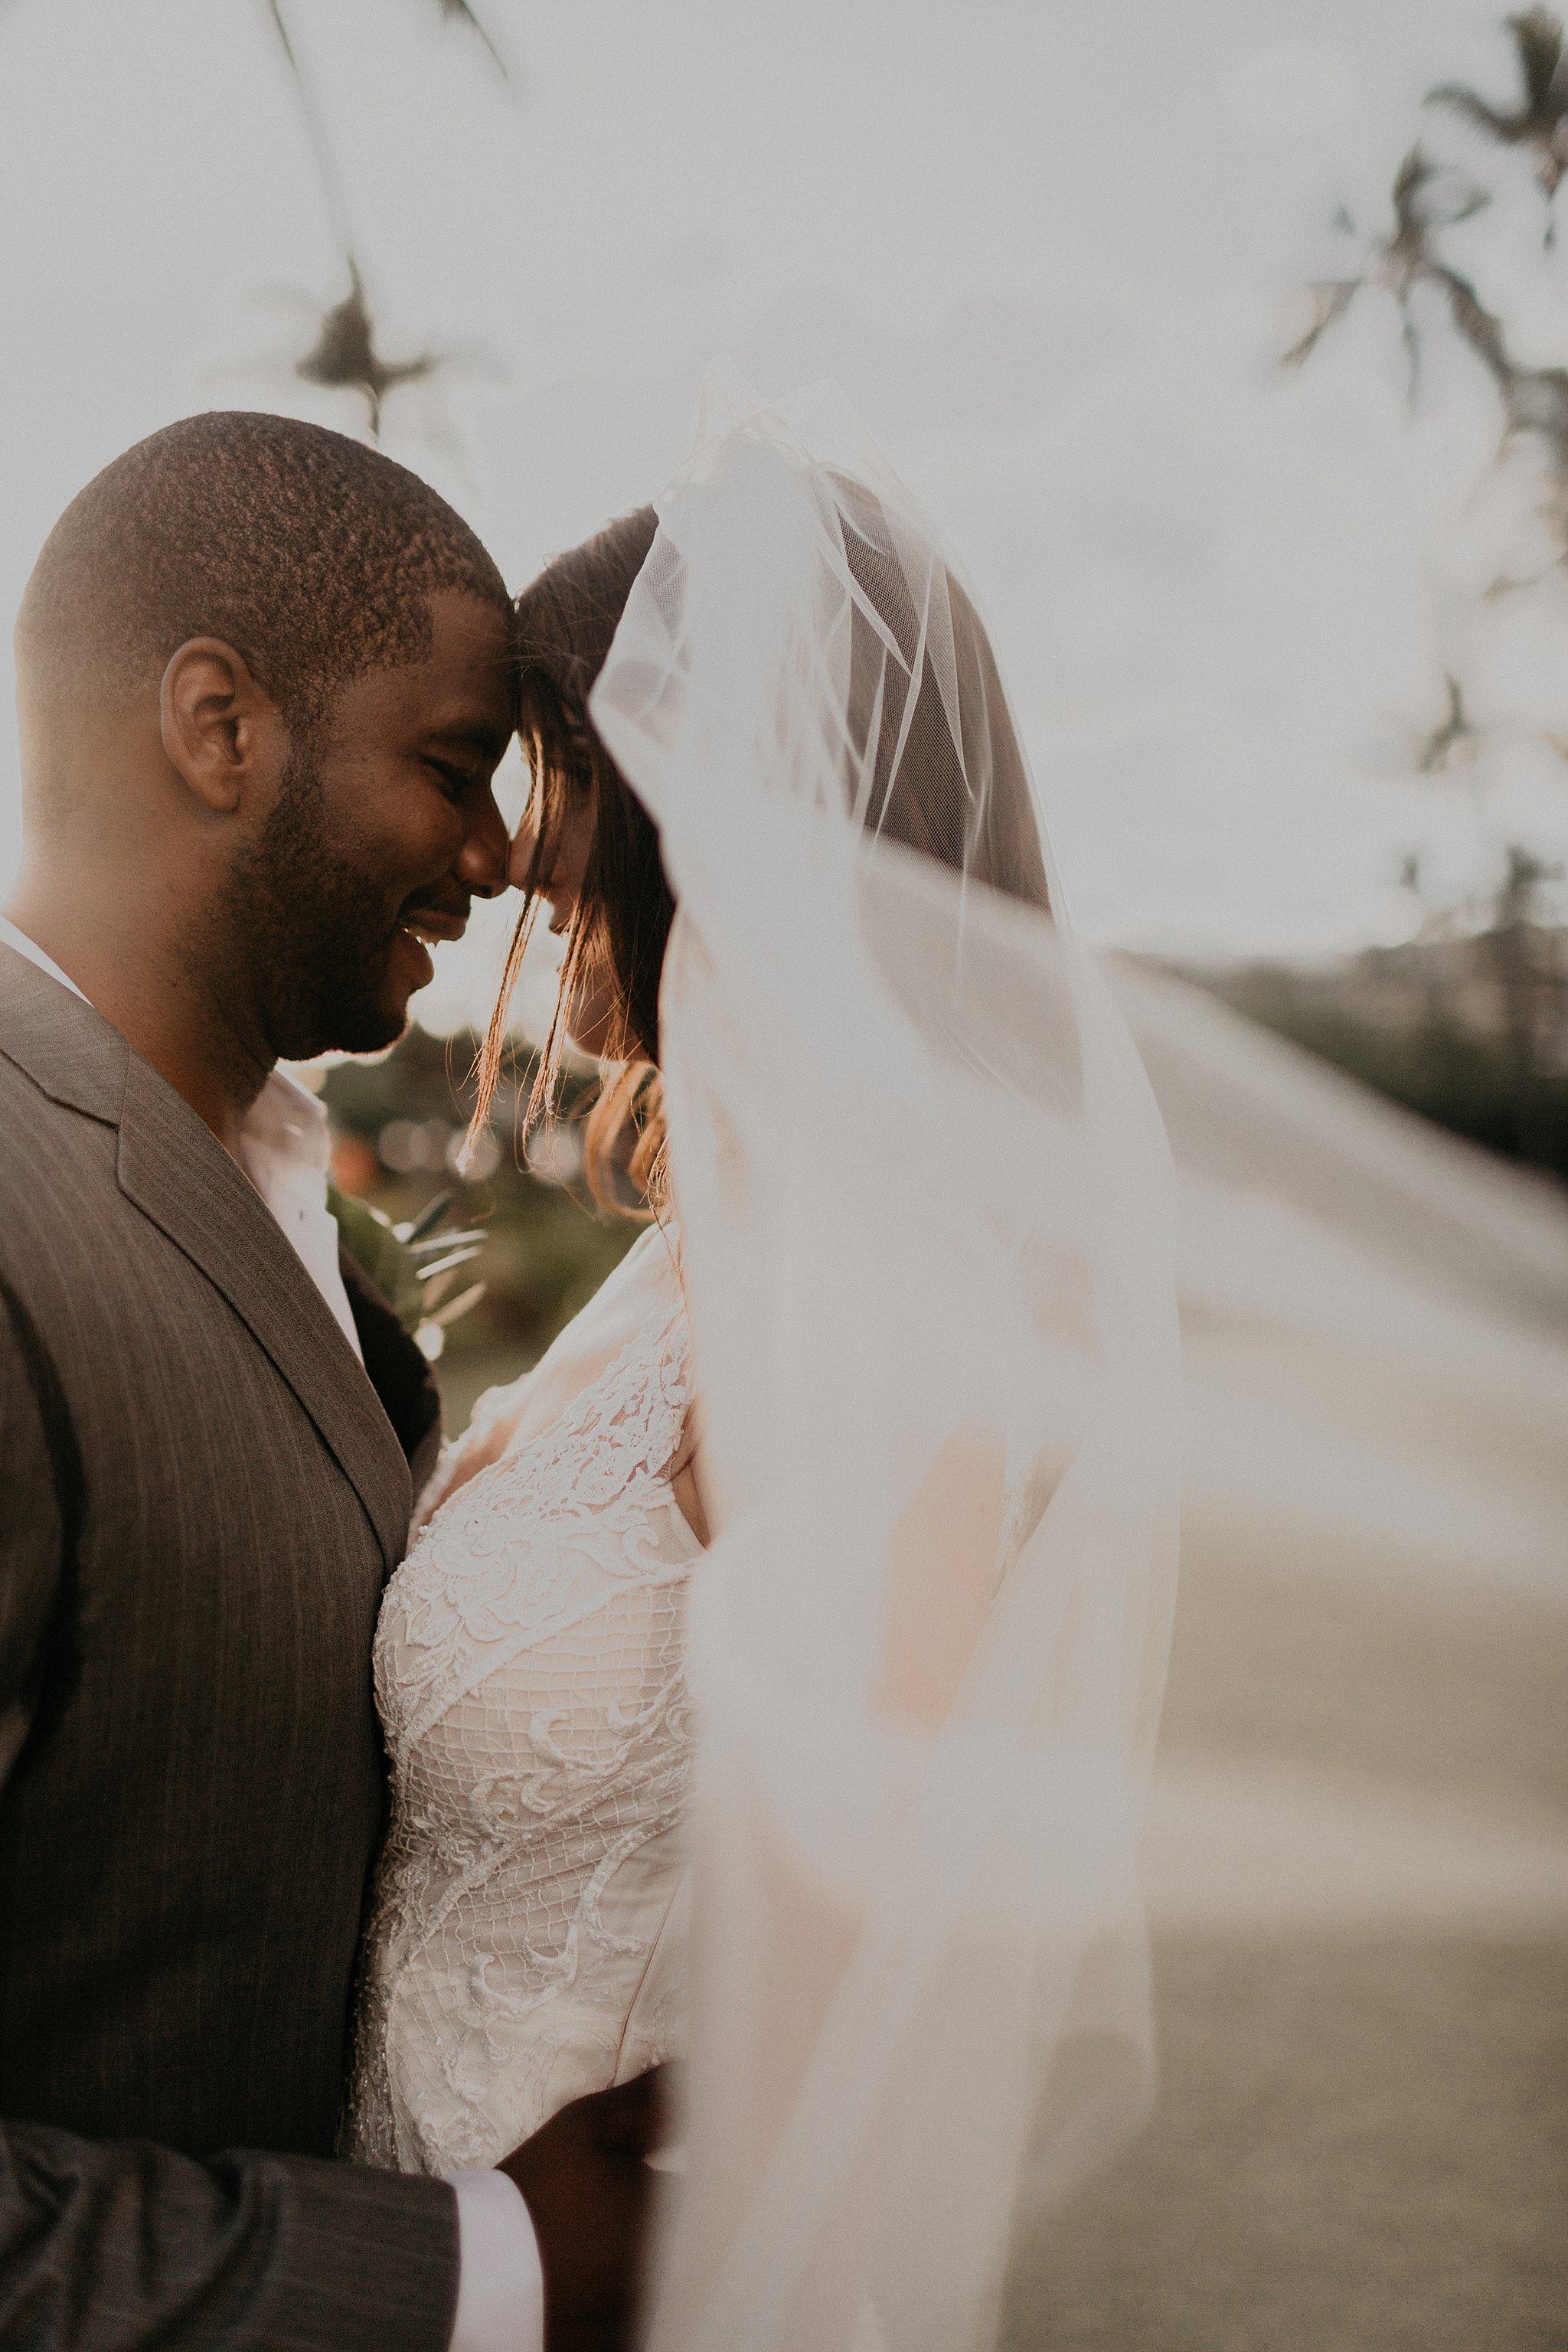 samantha_mcfarlen_bellingham_washington_engagement_photography_seattle_wedding_photographer_0242.jpg